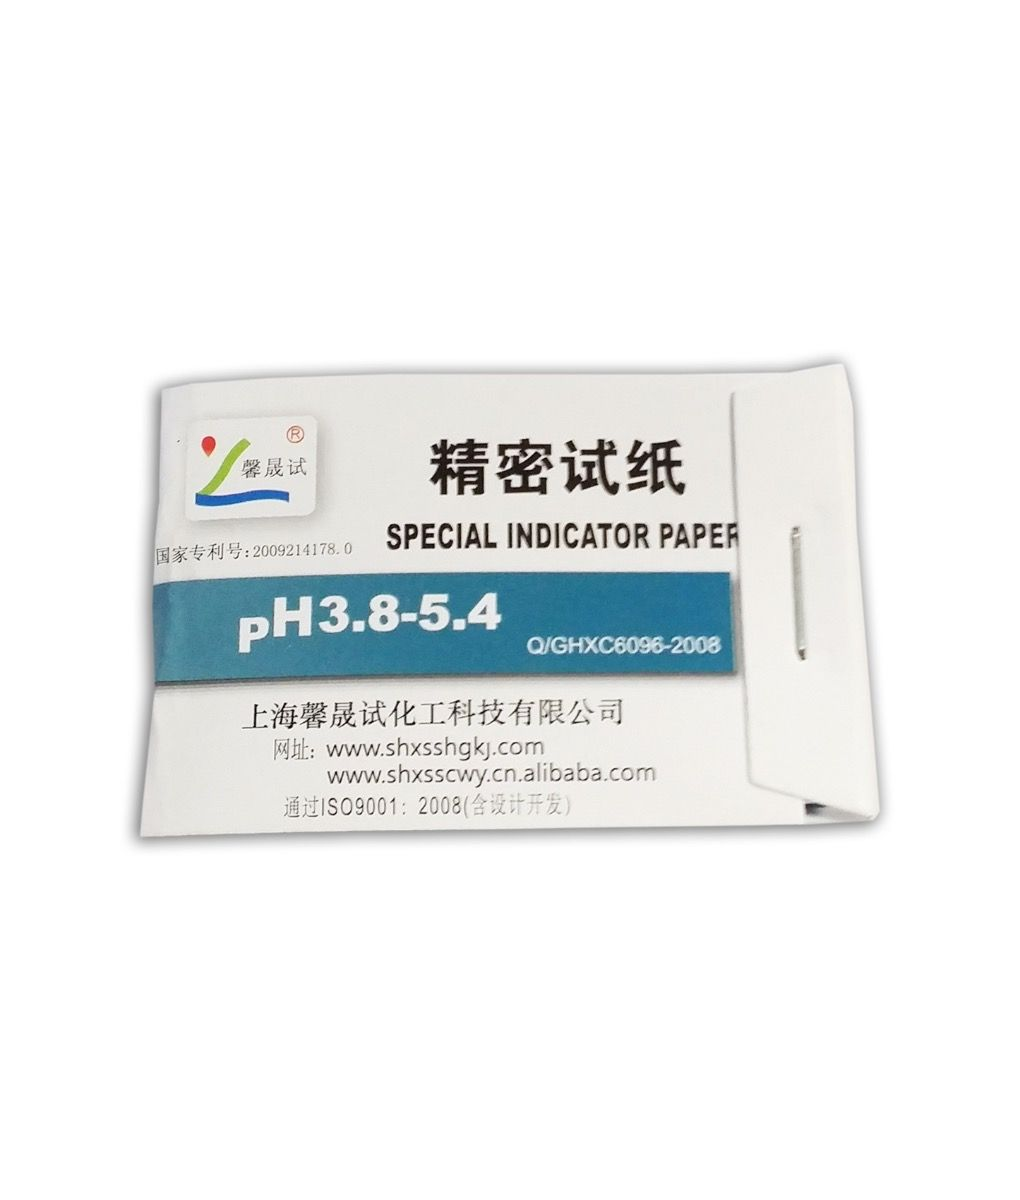 10 Narrow Range pH Papers 3.8 - 5.4